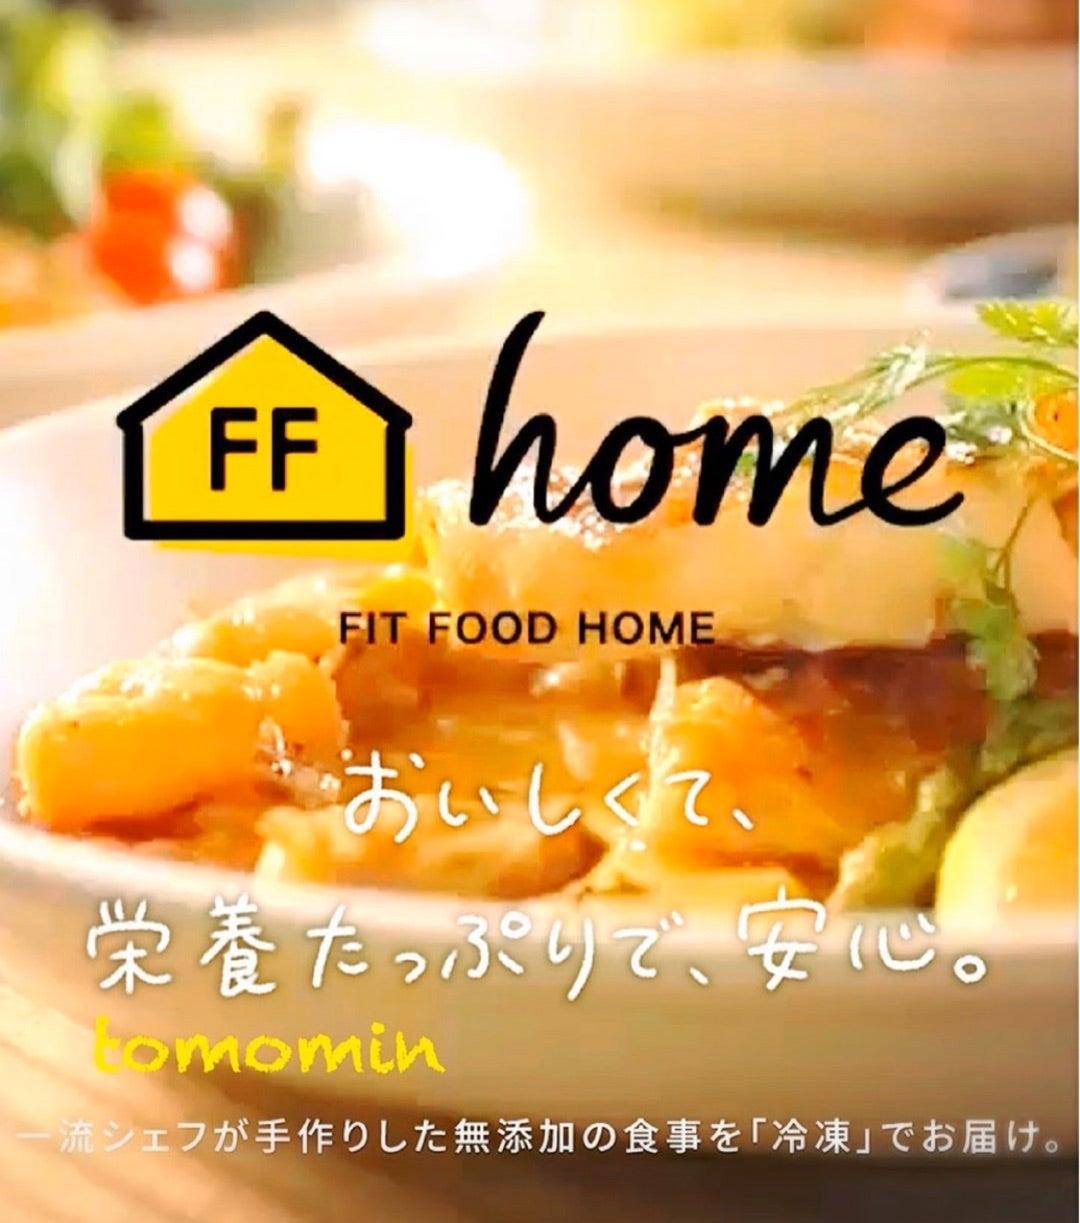 Fit Food Homeが5/1リニューアルオープン!!宅食のニューフェイス